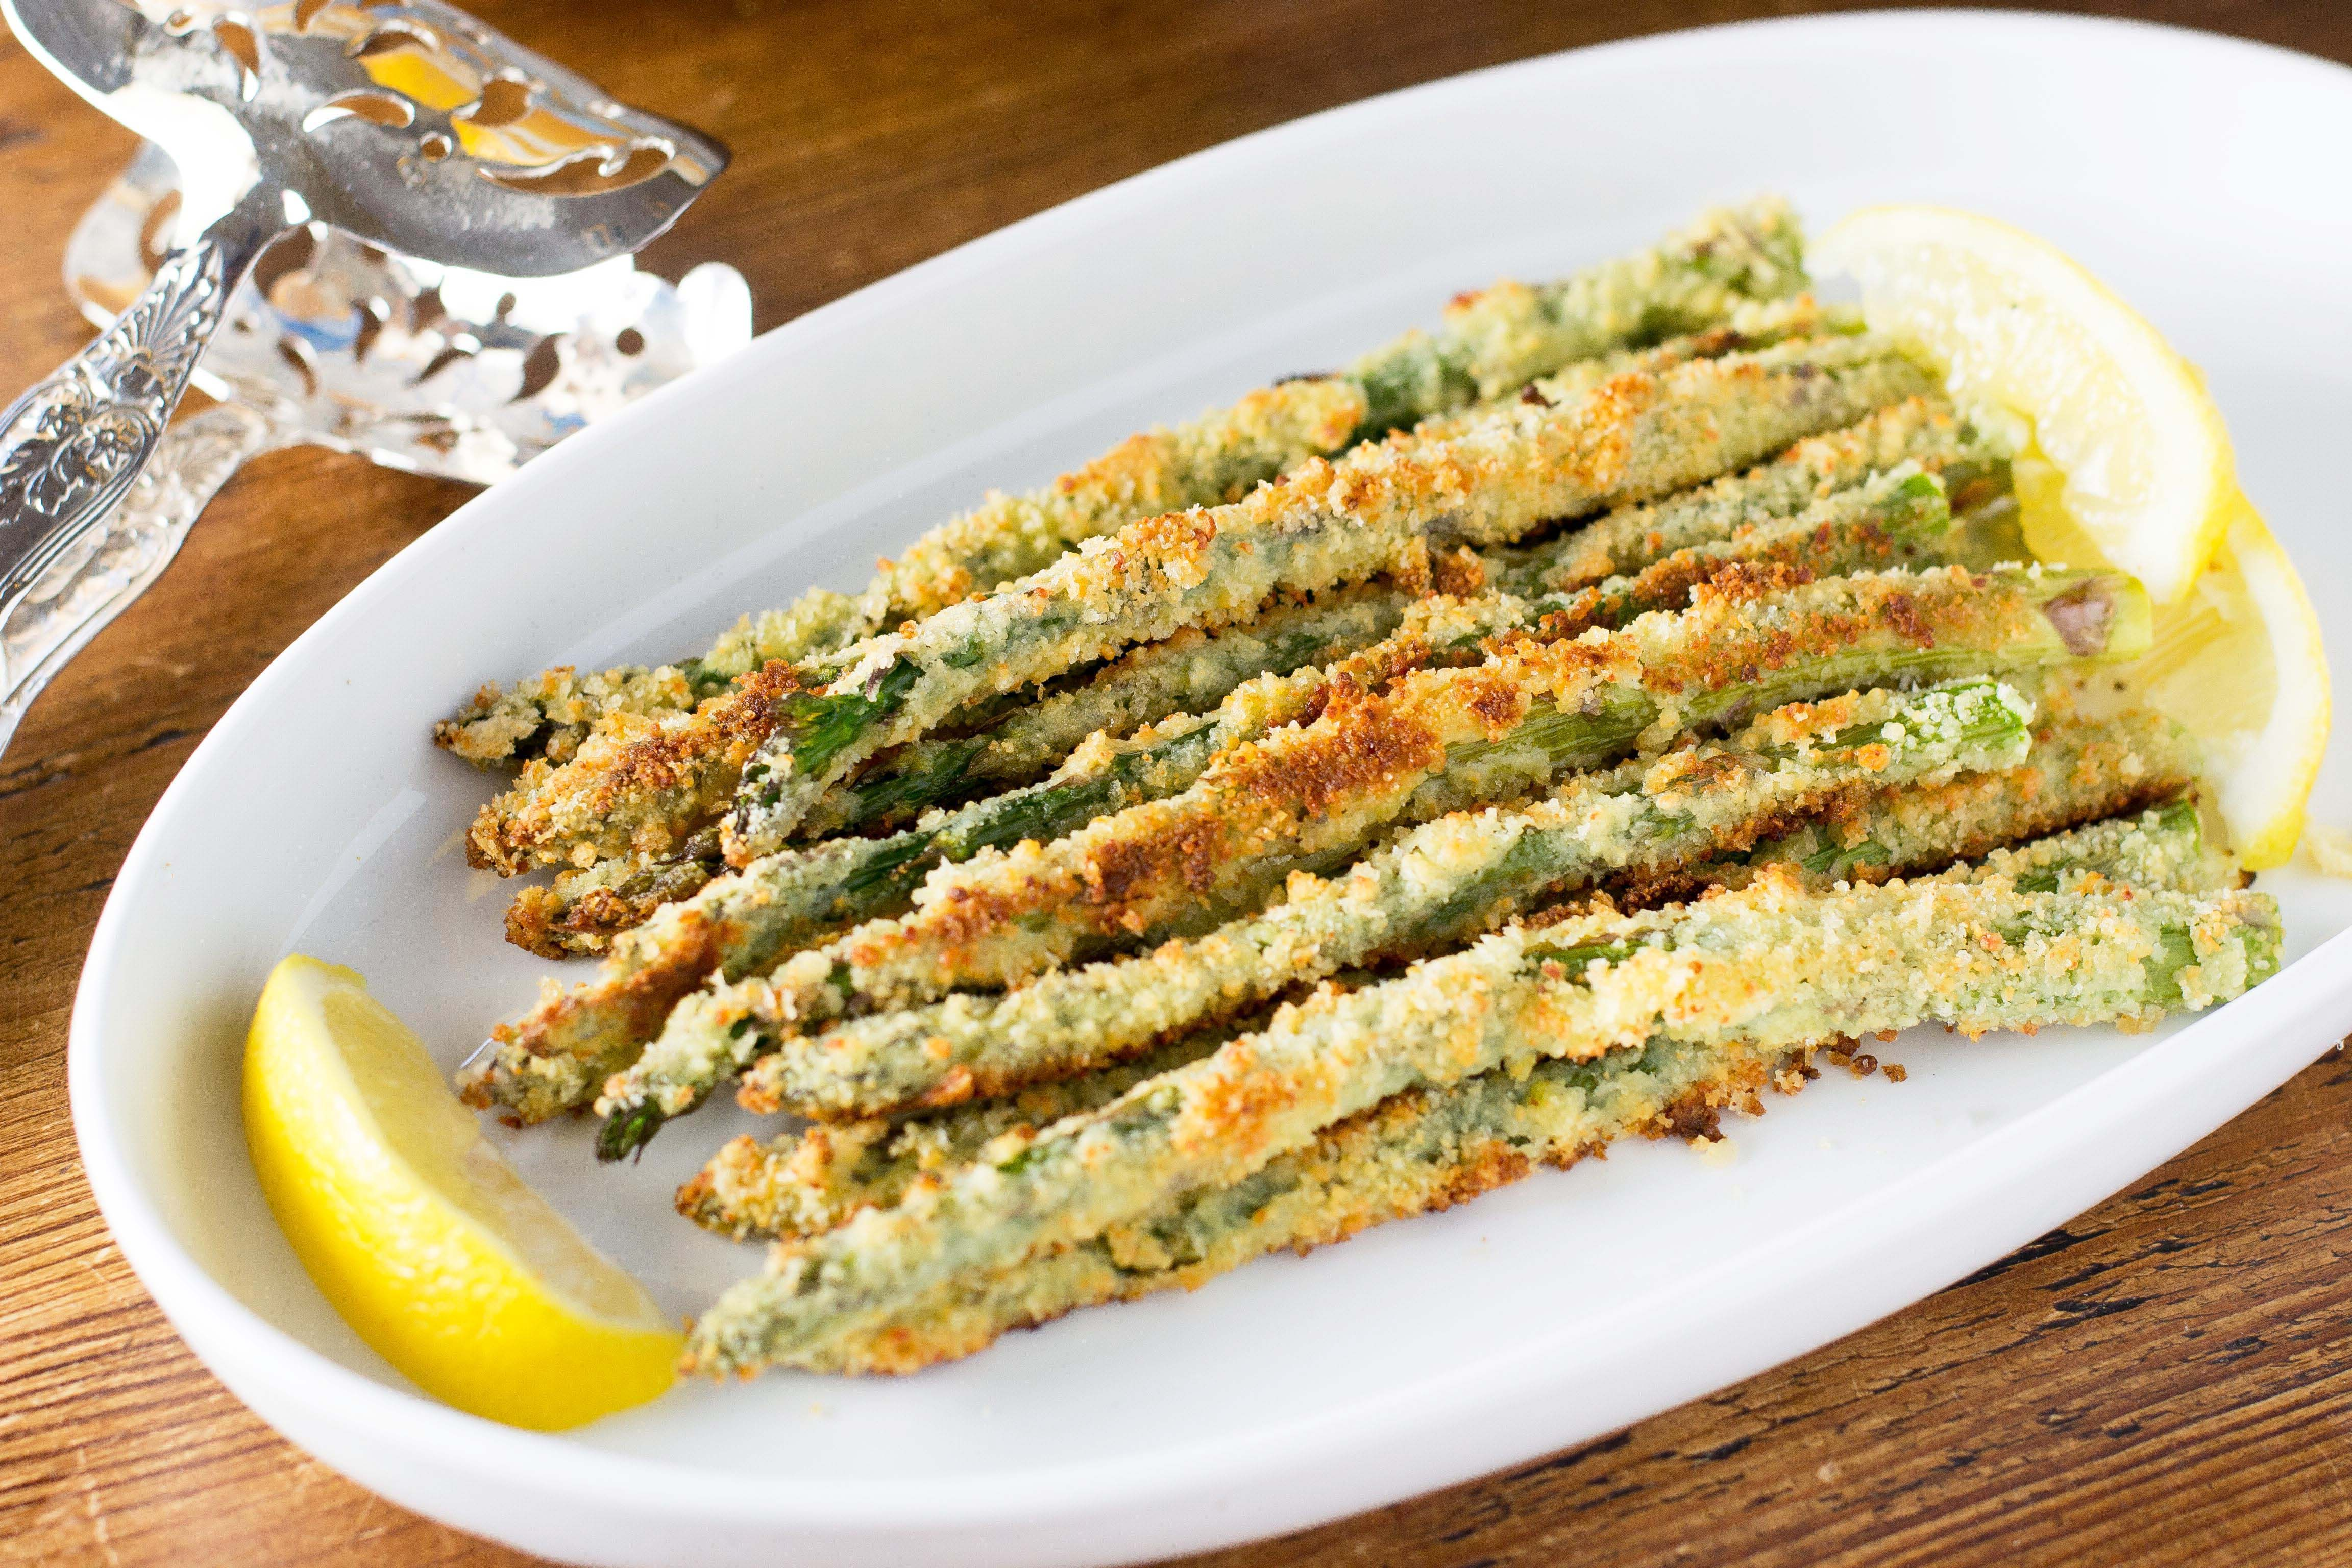 Panko Parmesan Crusted Asparagus - Asparagus is encased in a crispy ...